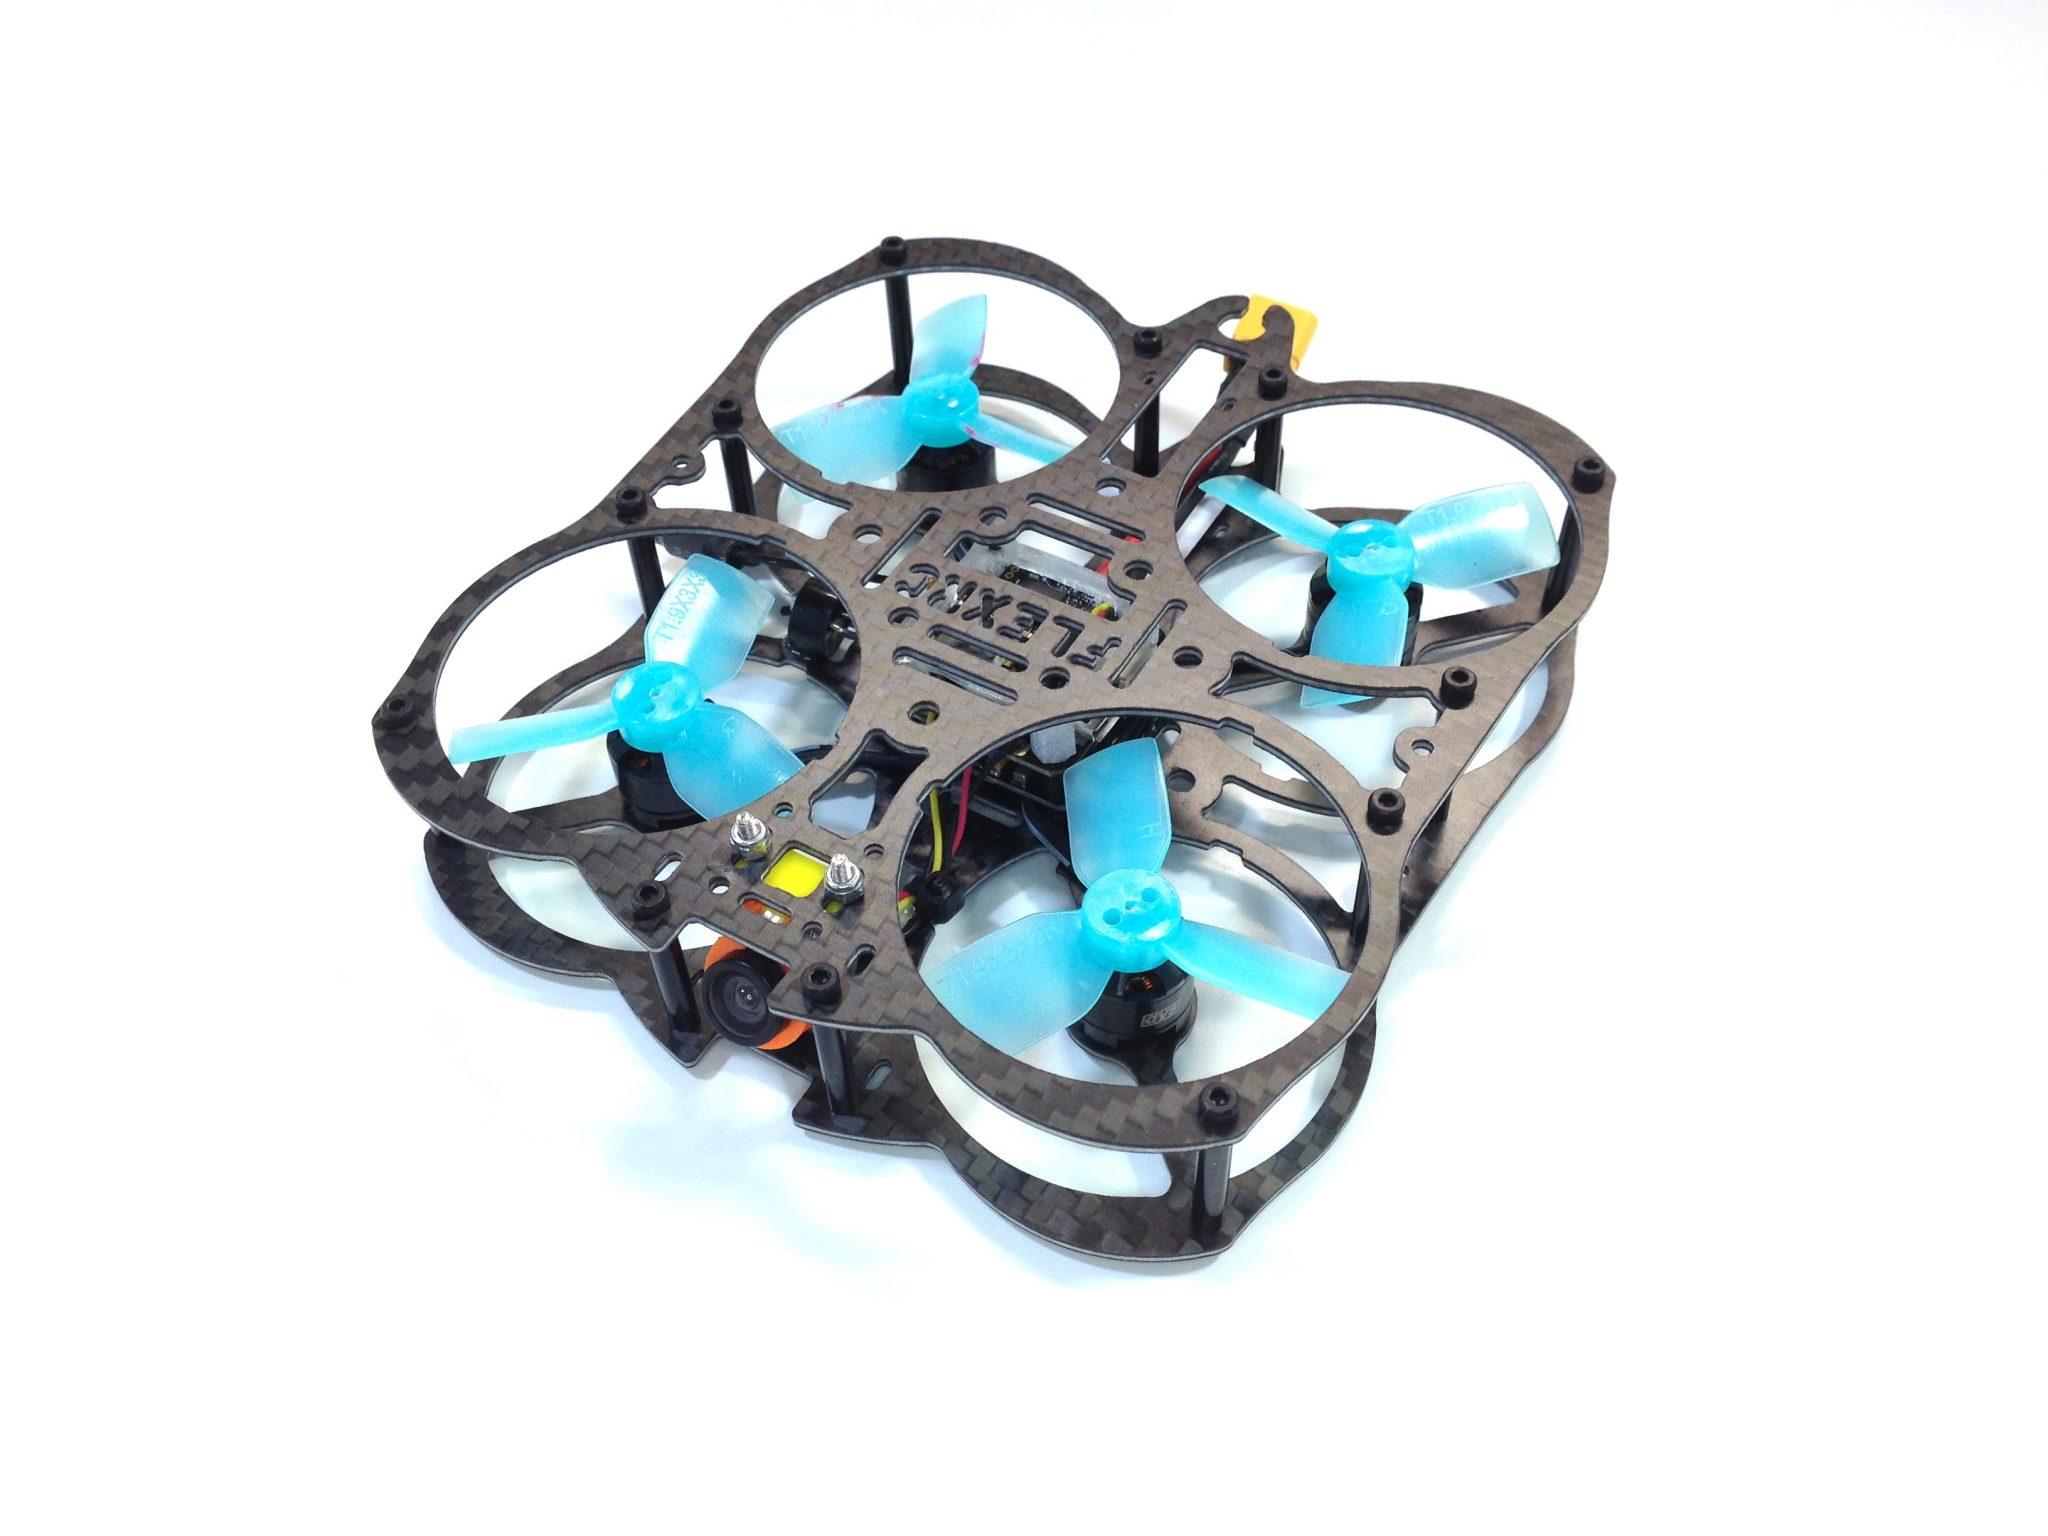 Mini Owl – Extreme – FPV Proximity Racing Drone – DIY Kit – Flex RC